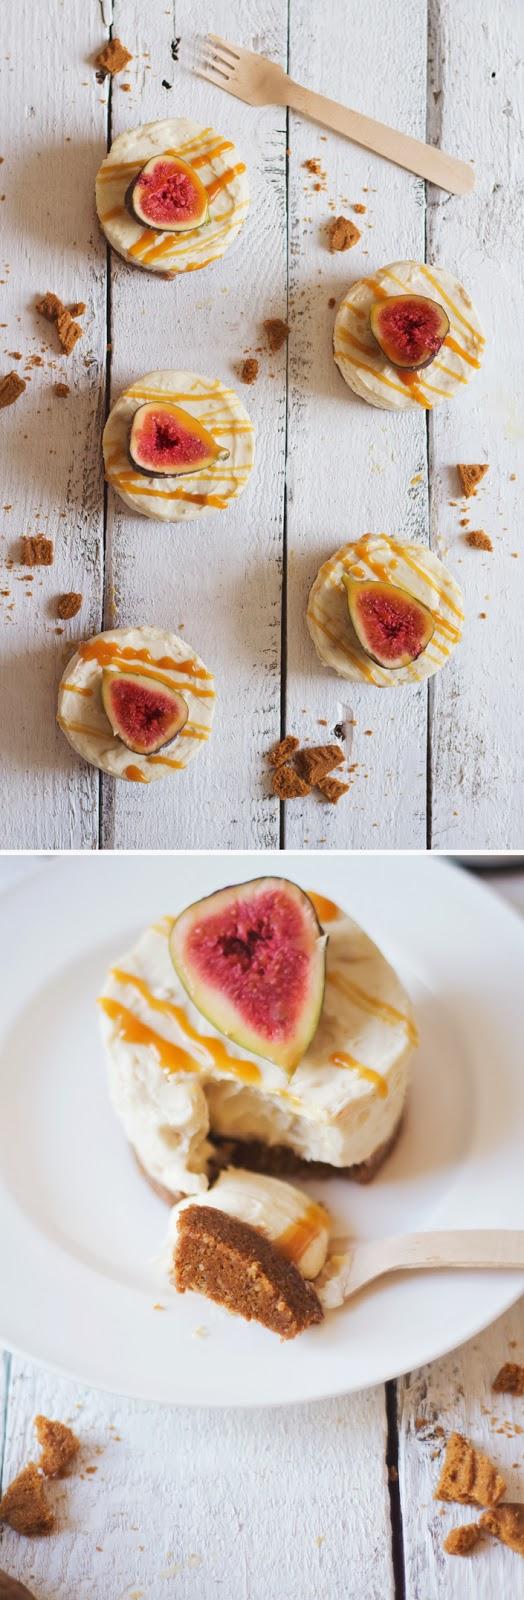 fig-and-pear-spiced-cheesecake-4.jpg